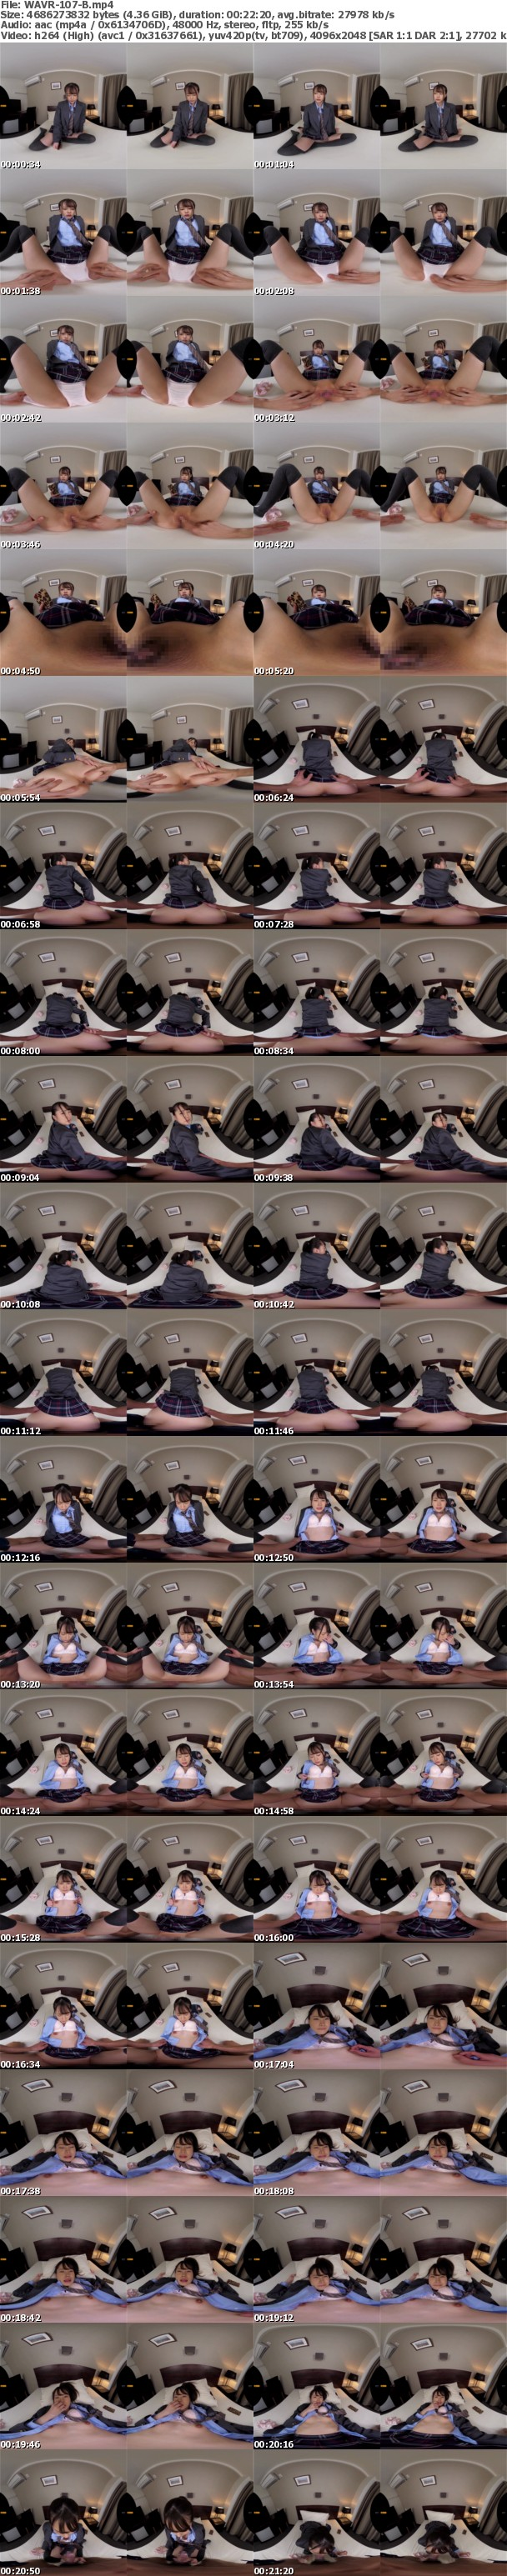 (VR) WAVR-107 真珠チ●ポVR 超塩対応の不感症J●がイカされまくって完全敗北!